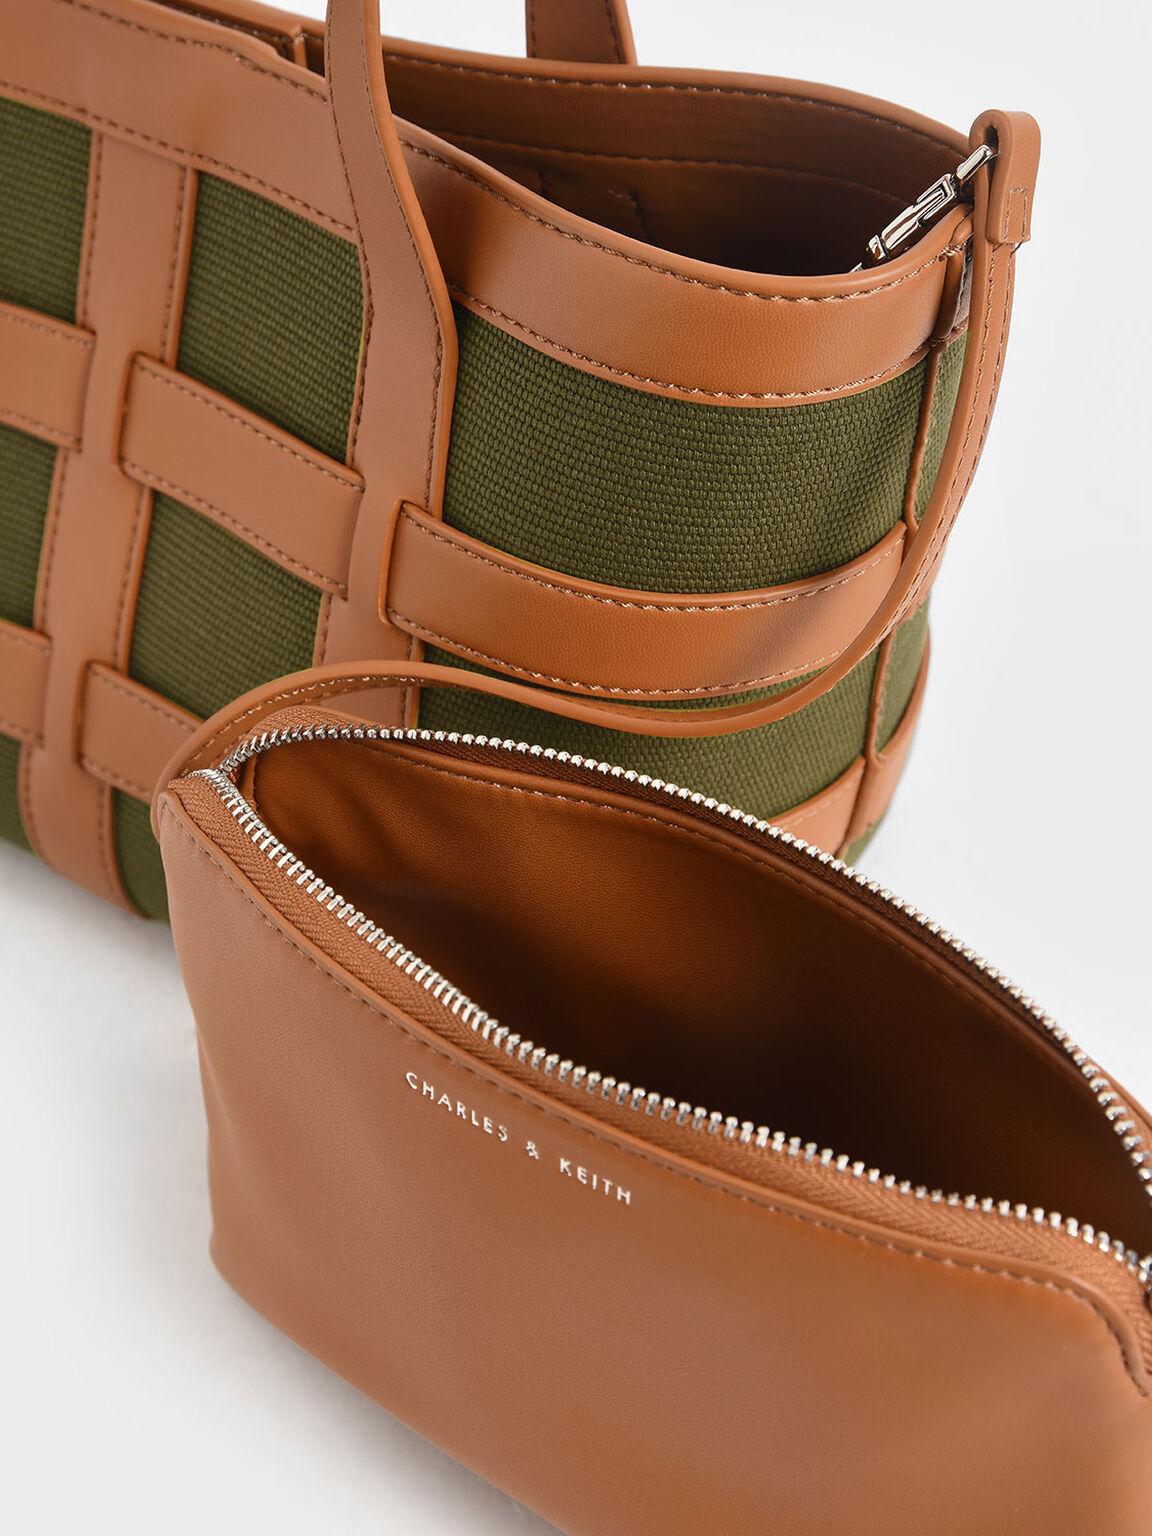 格狀中型托特包, 橄欖色, hi-res